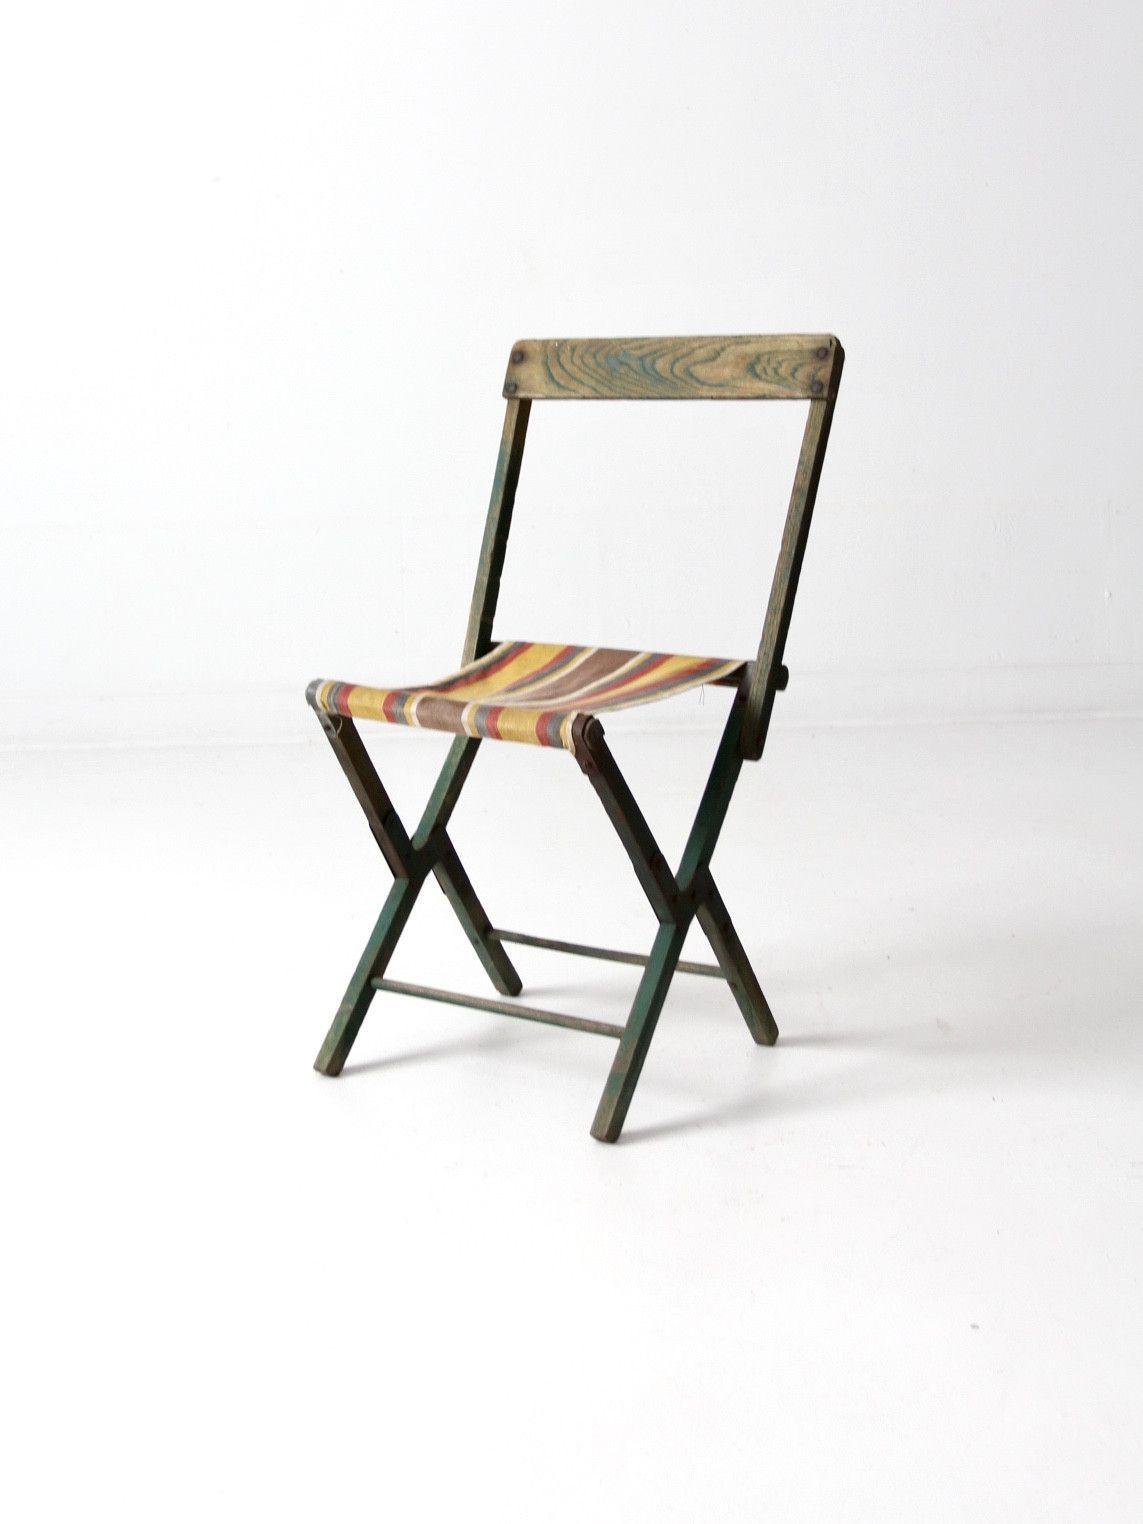 Vintage Folding Camp Chair